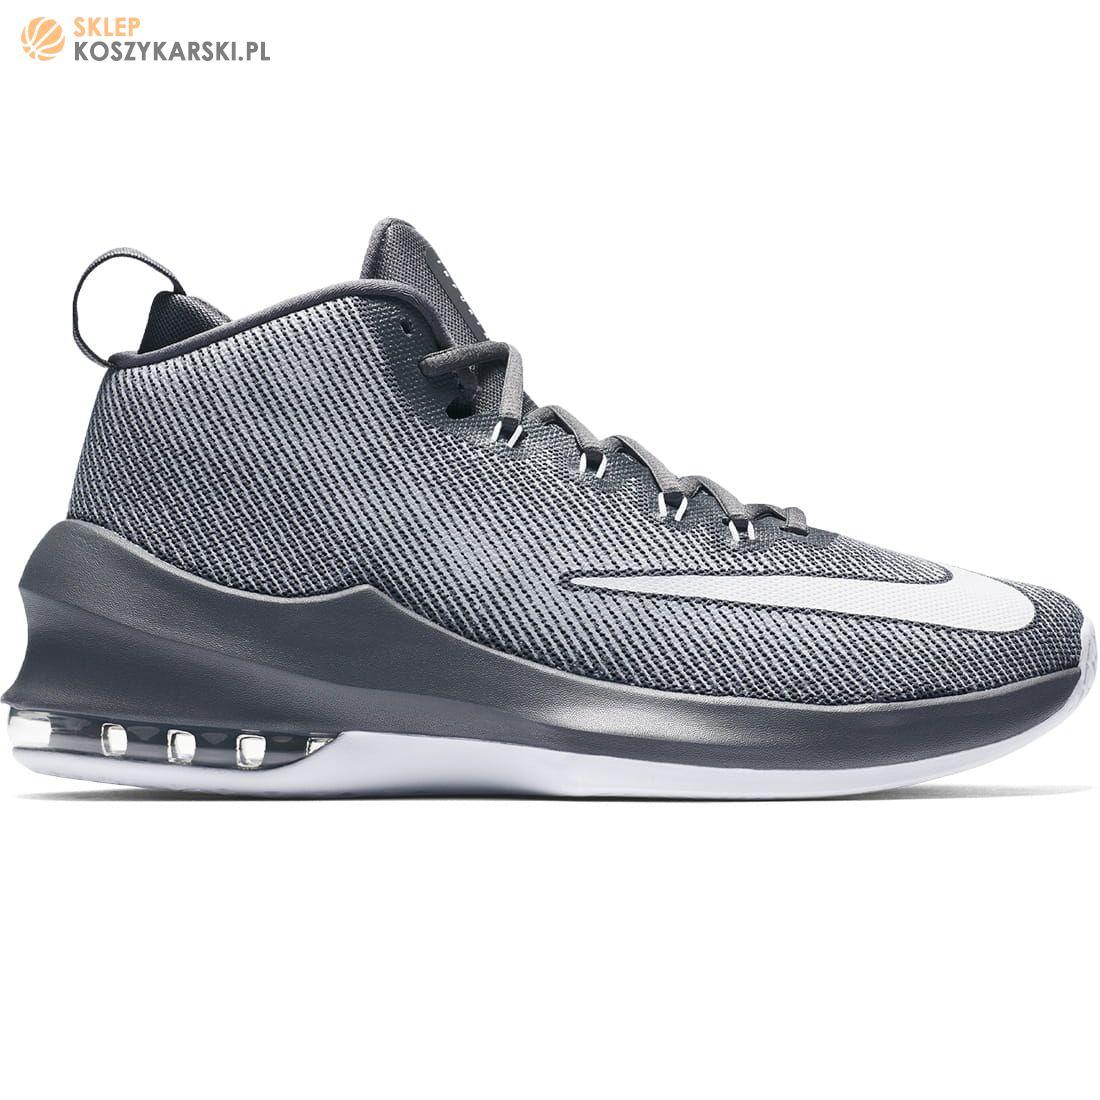 a78ff510321c4 Buty do koszykówki Nike Air Max Infuriate Mid (AA4438-011)